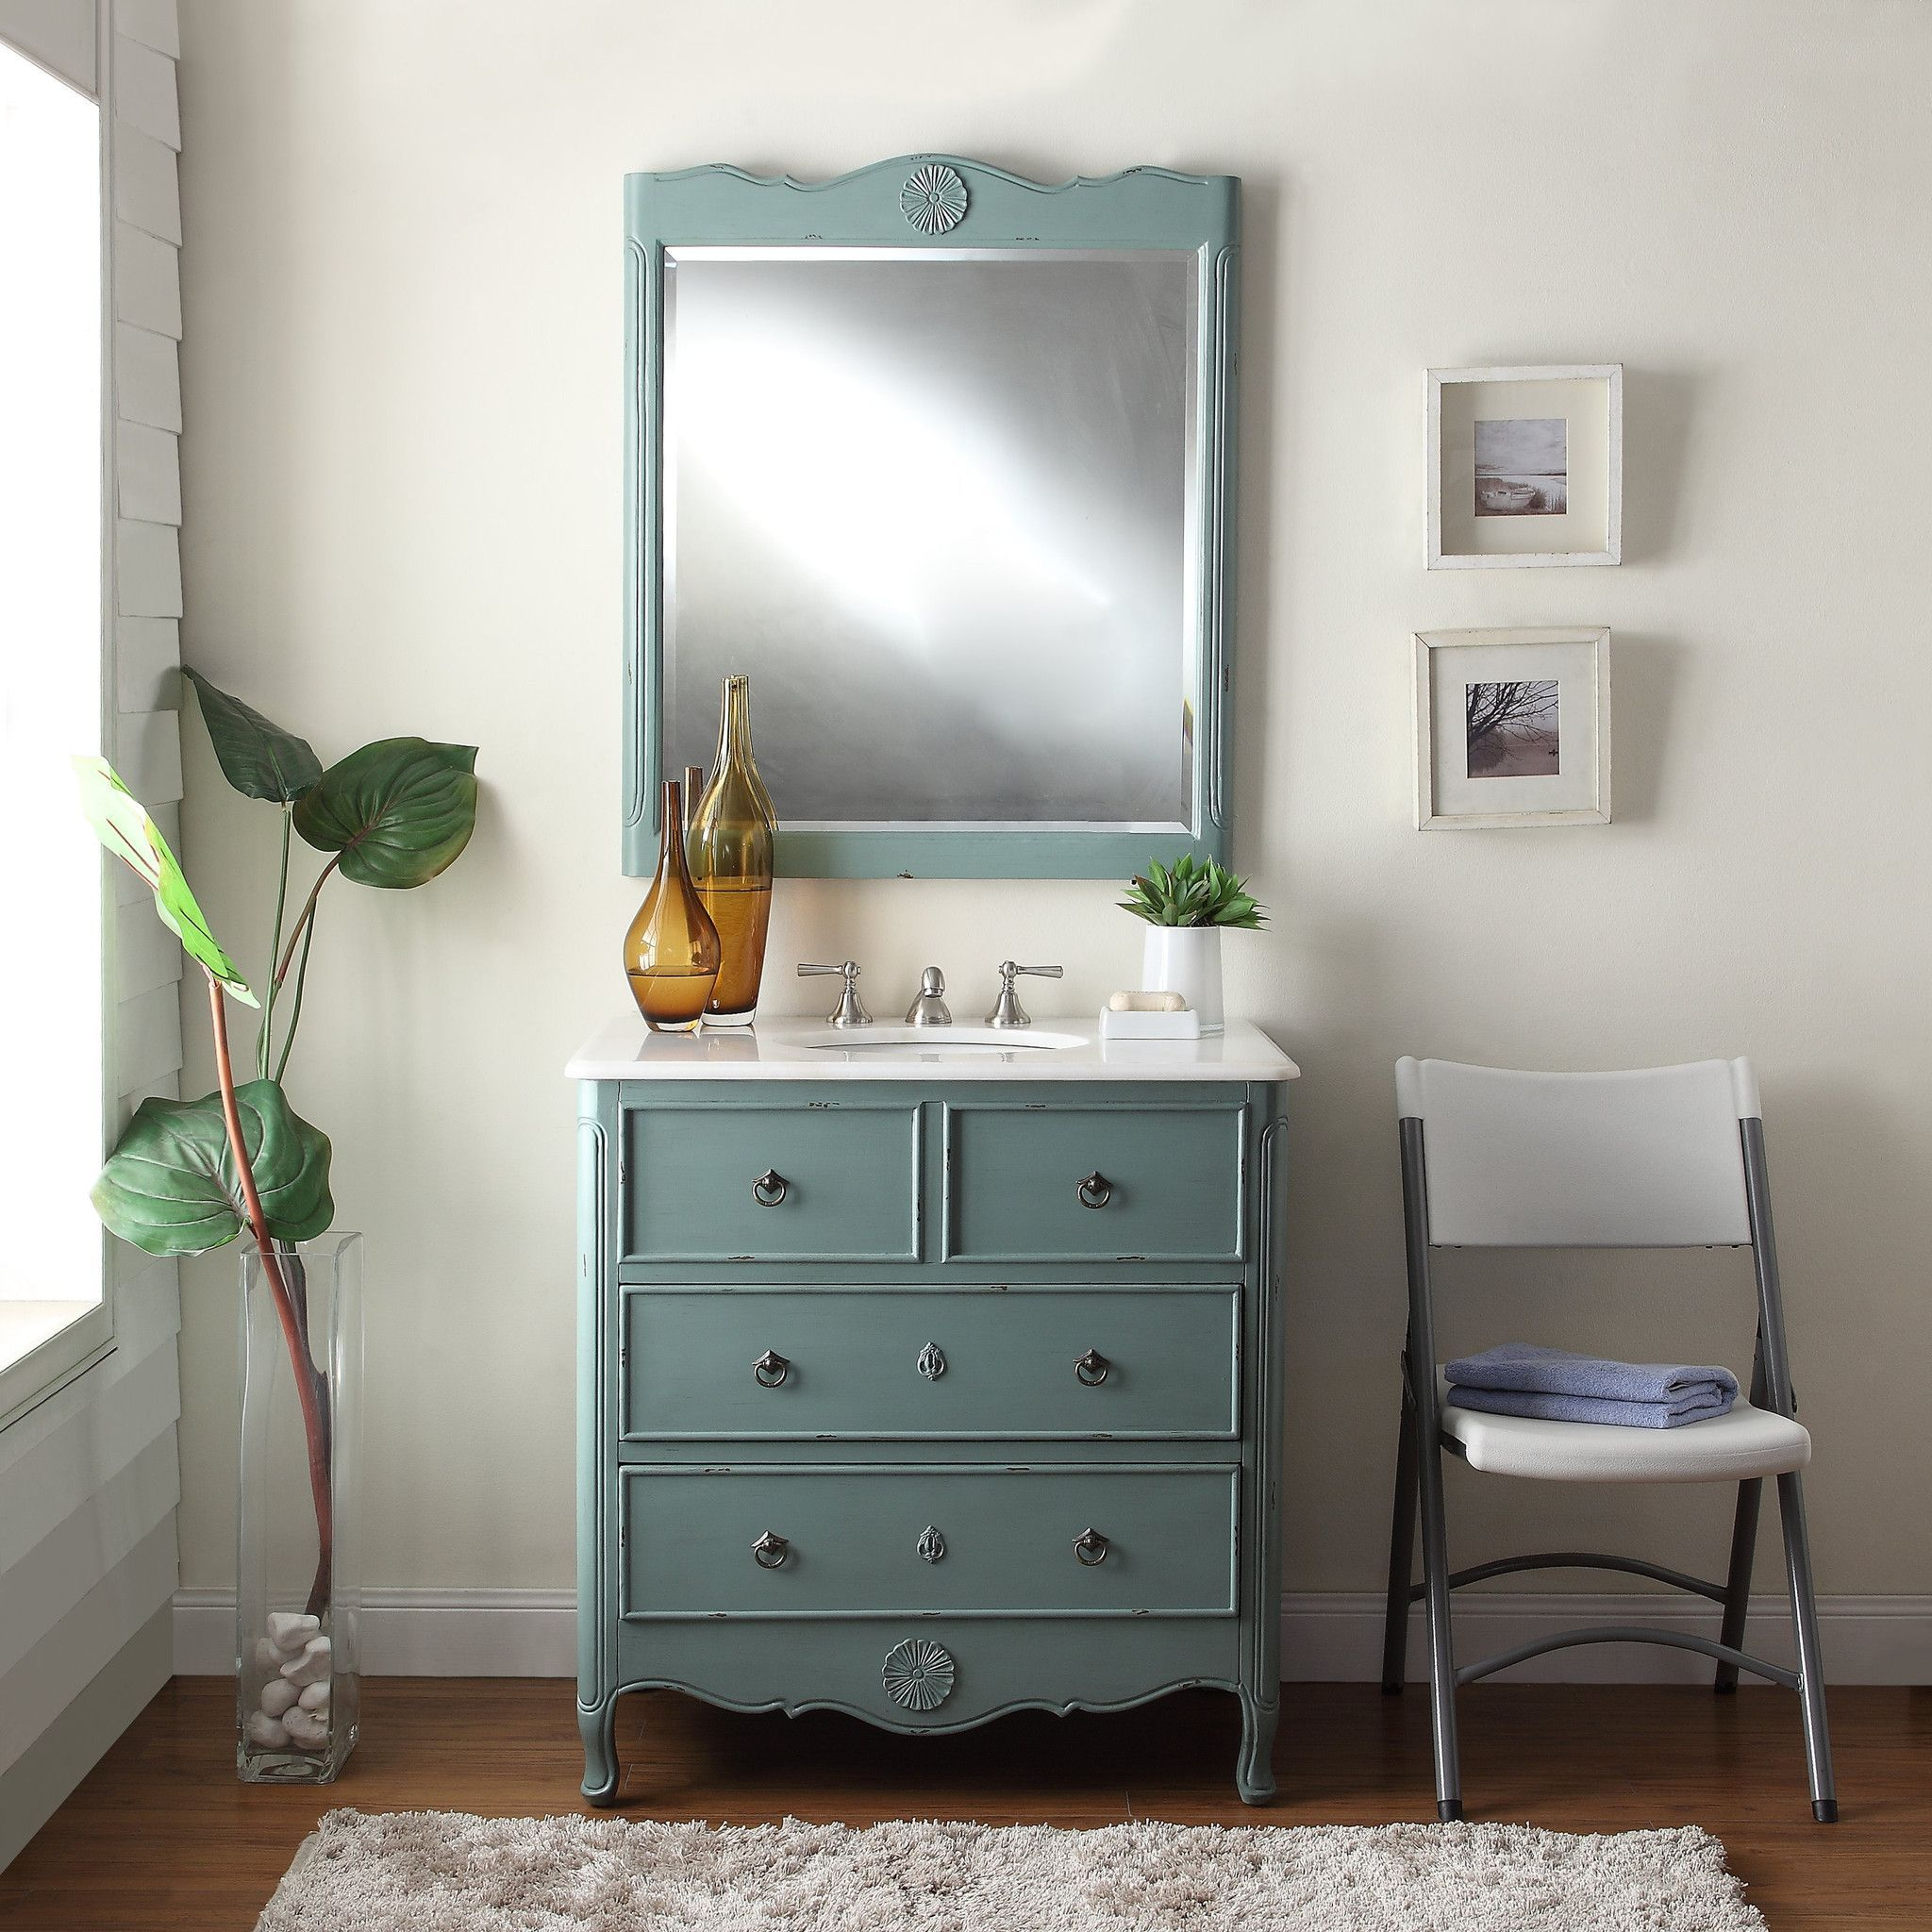 diy distressed bathroom vanity%0A      Distress Vantage Blue Daleville Bathroom Sink Vanity  u     Mirror Set  HF   Y